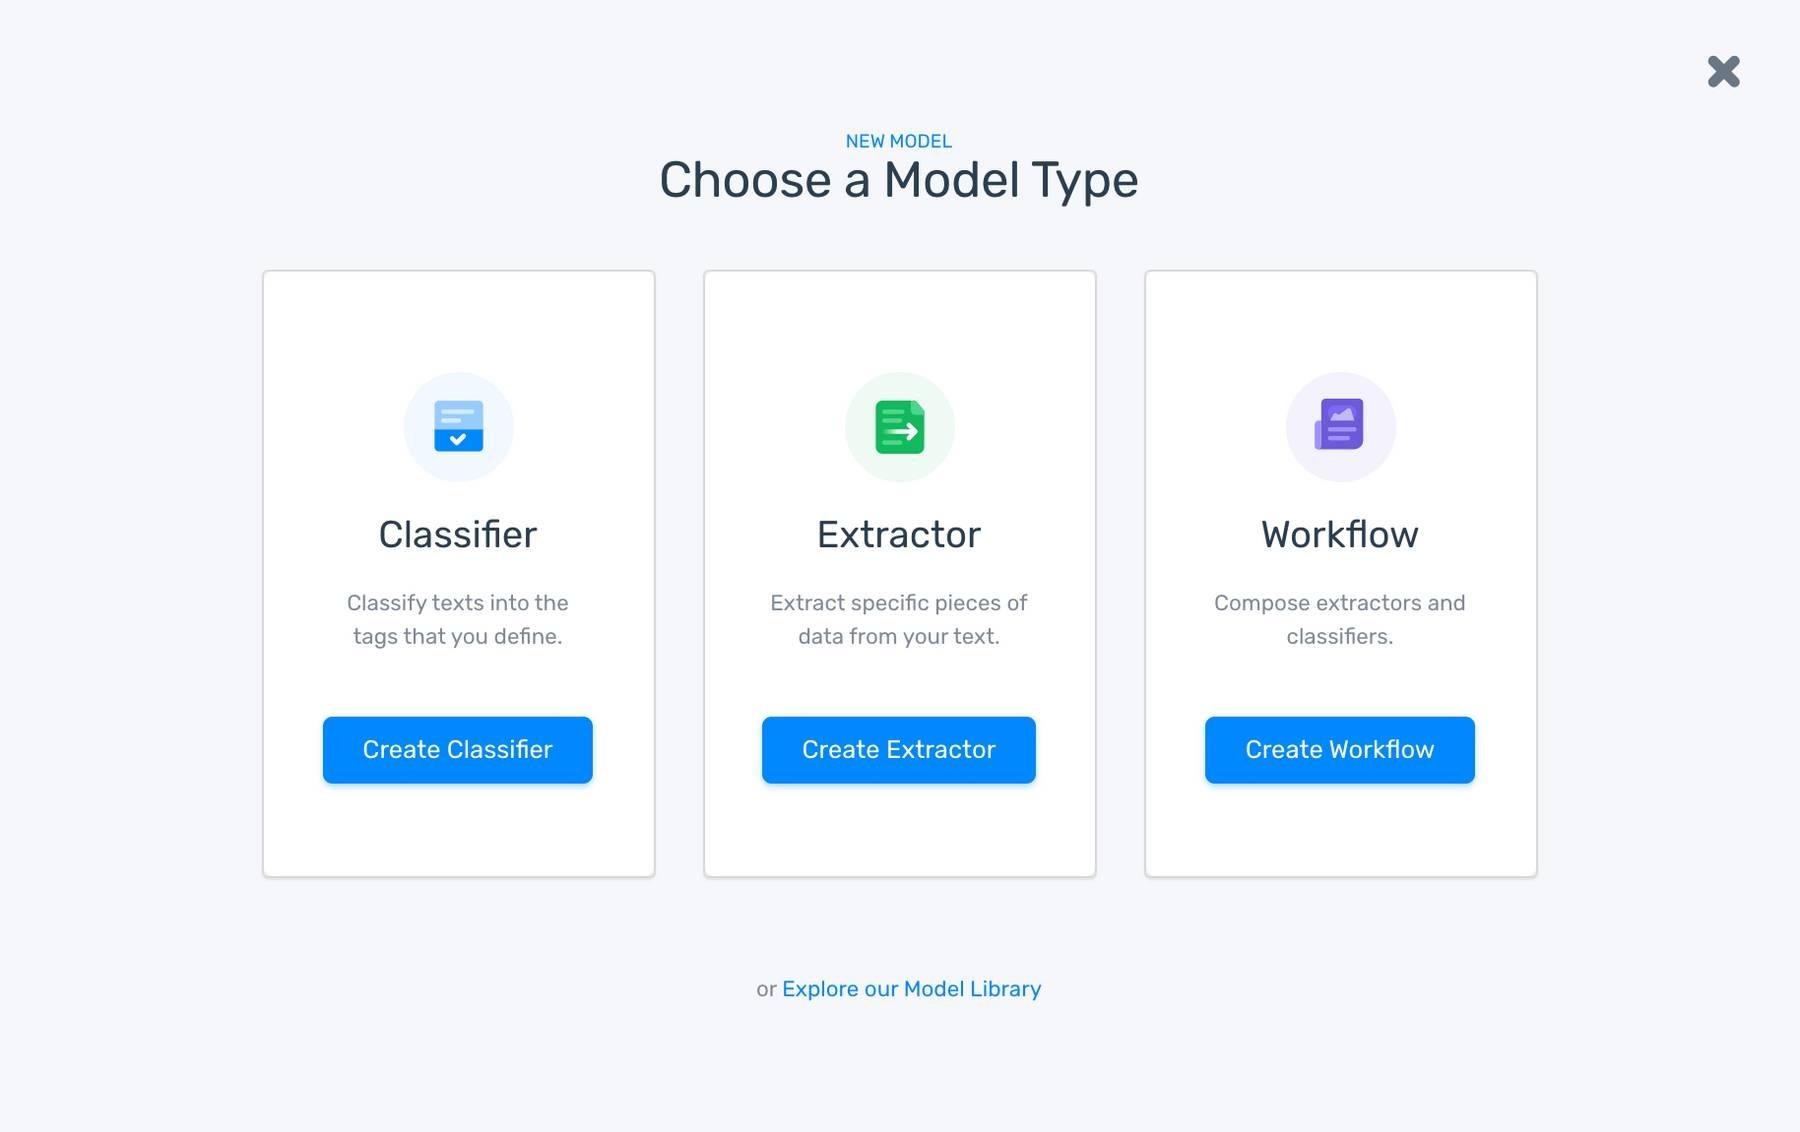 Create a Model